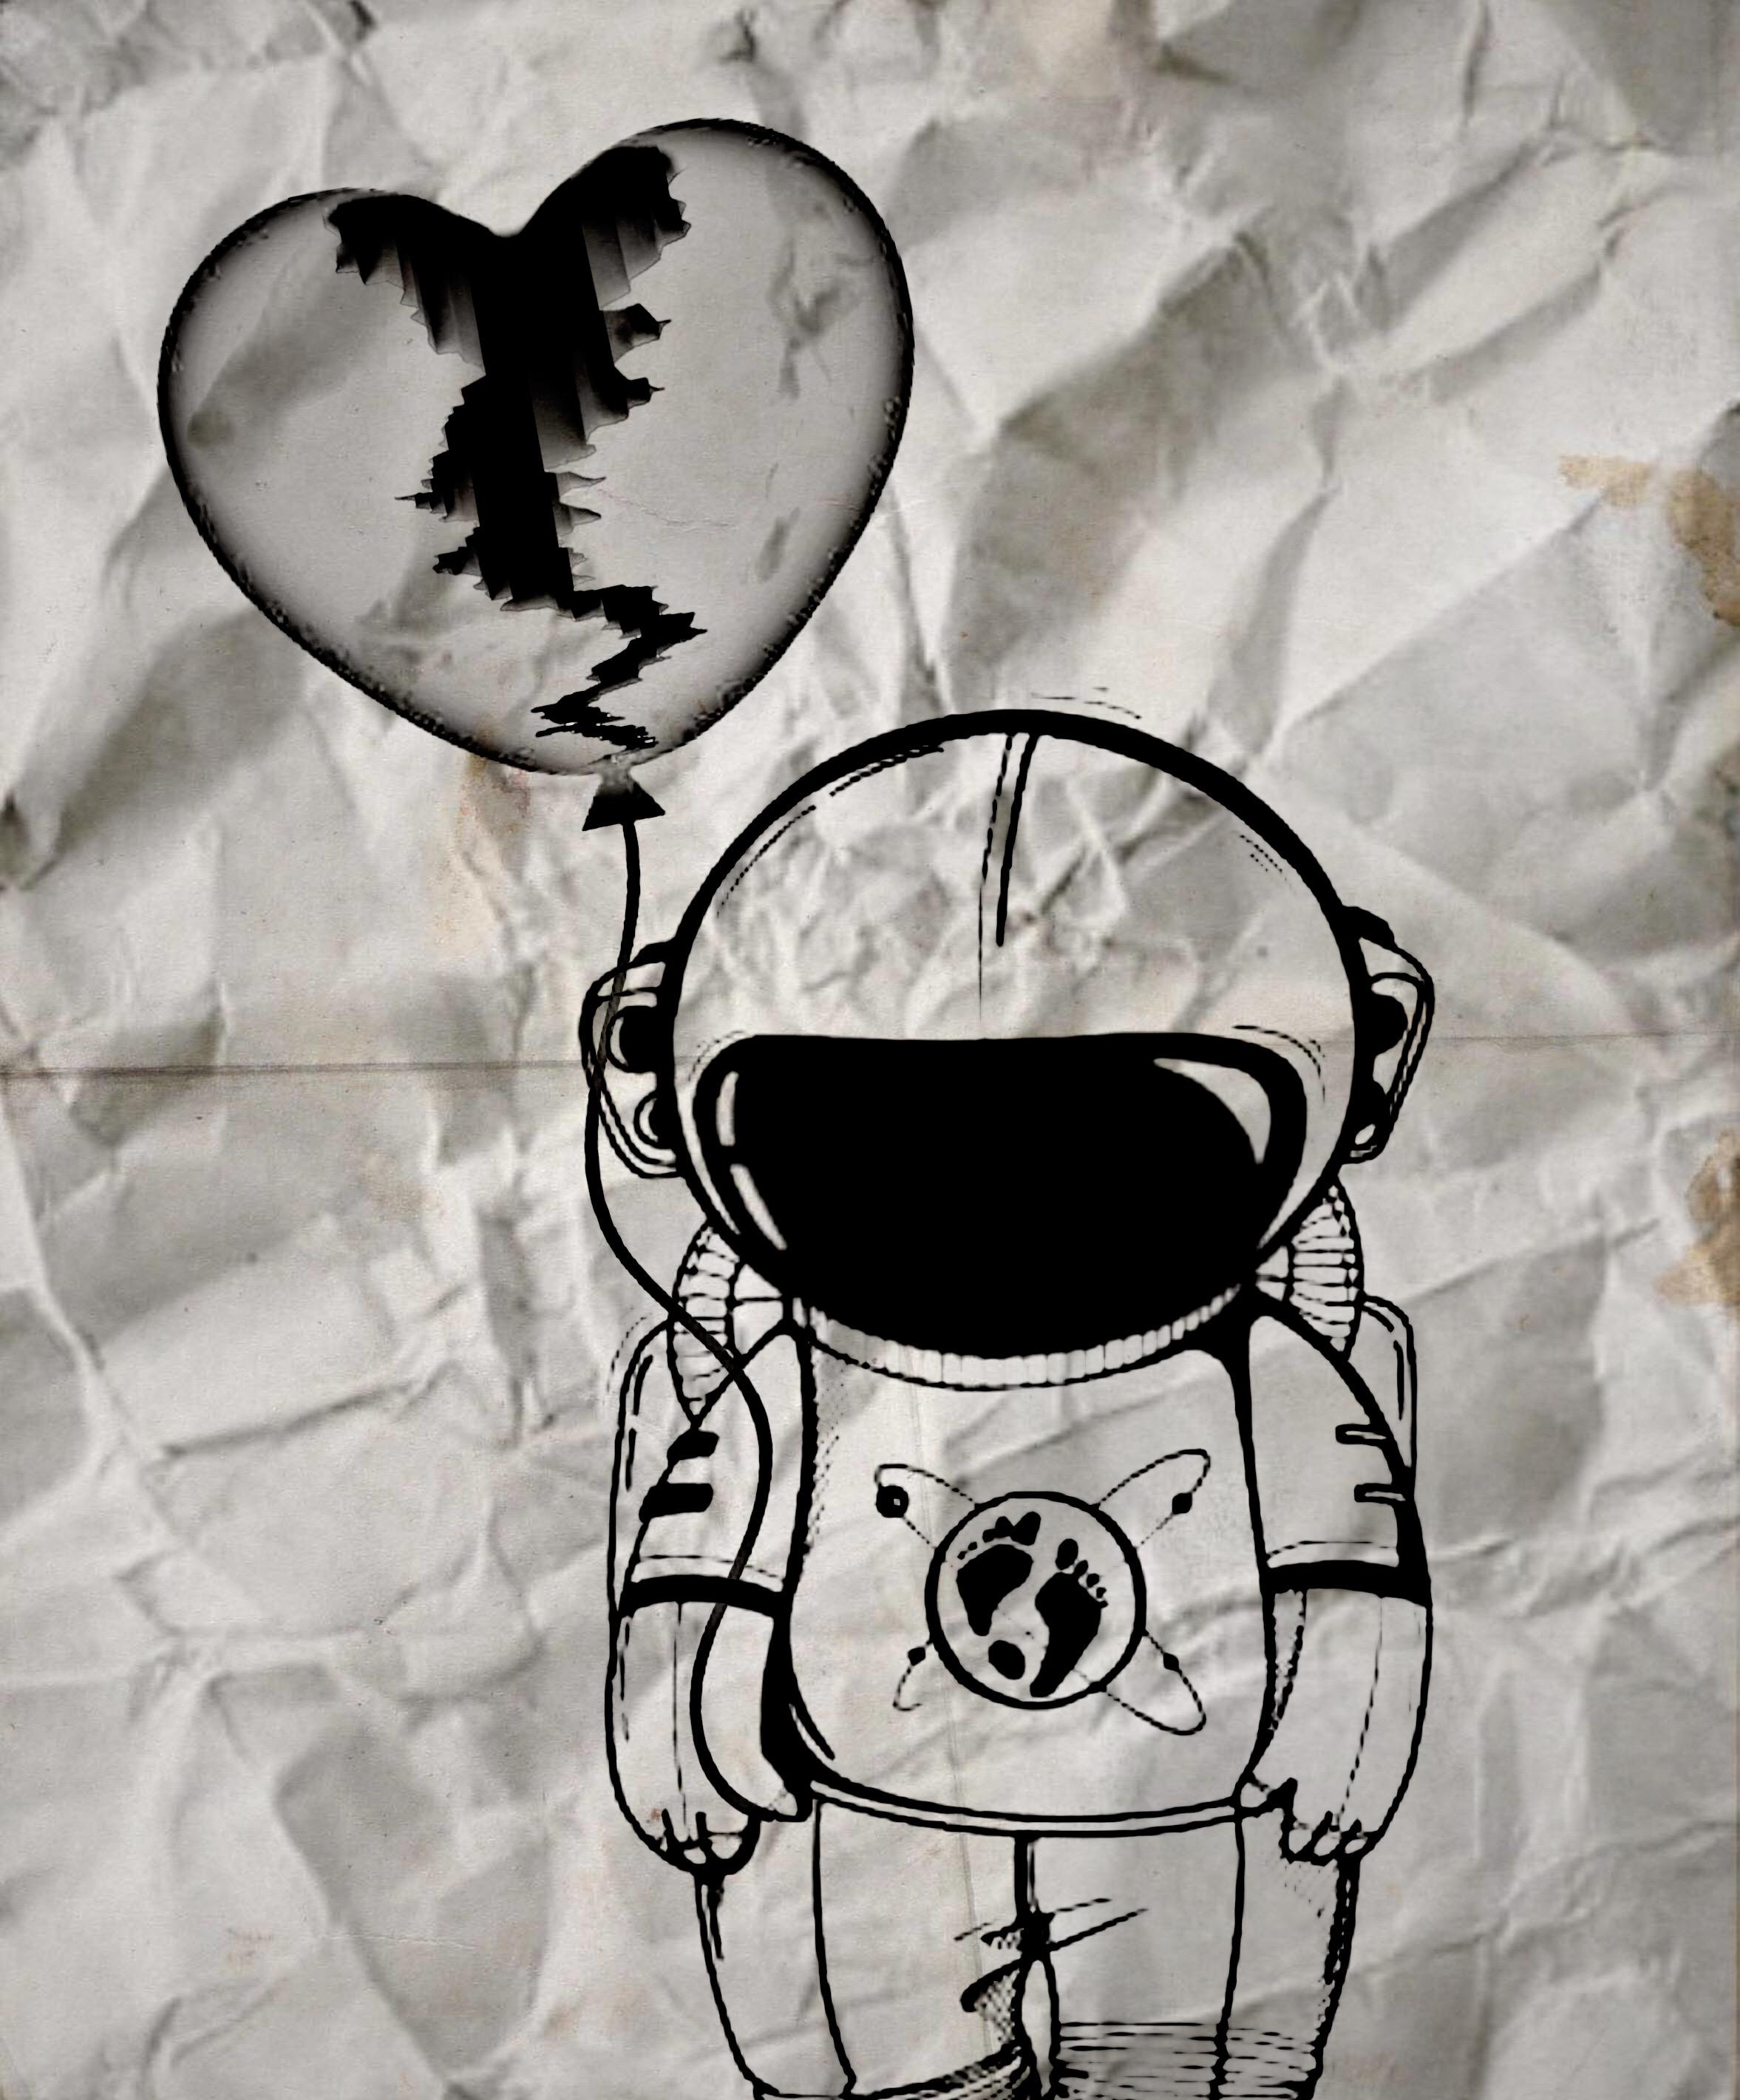 Freetoedit Papel Desenho Coracao Partido Astronaut News